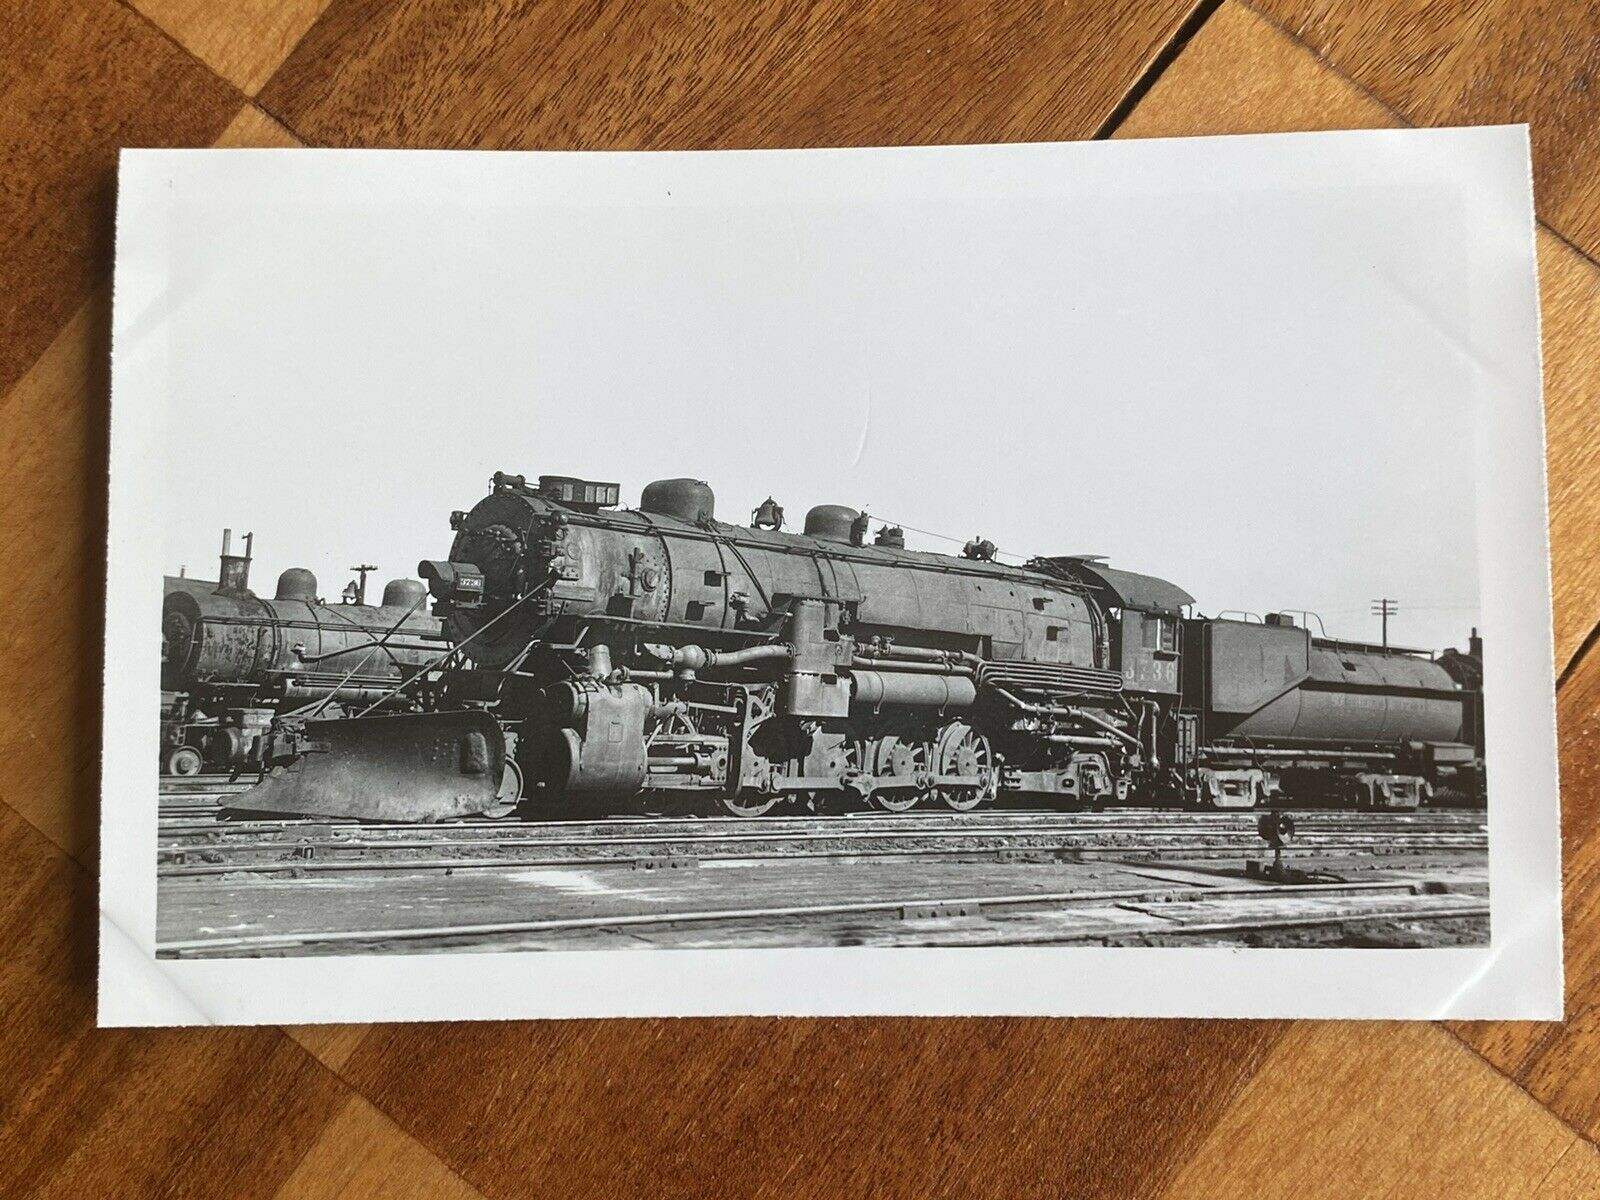 Southern Pacific Railroad Train Engine Locomotive No 3736 Antique Photo Ebay Train Engines Locomotive Antique Photos